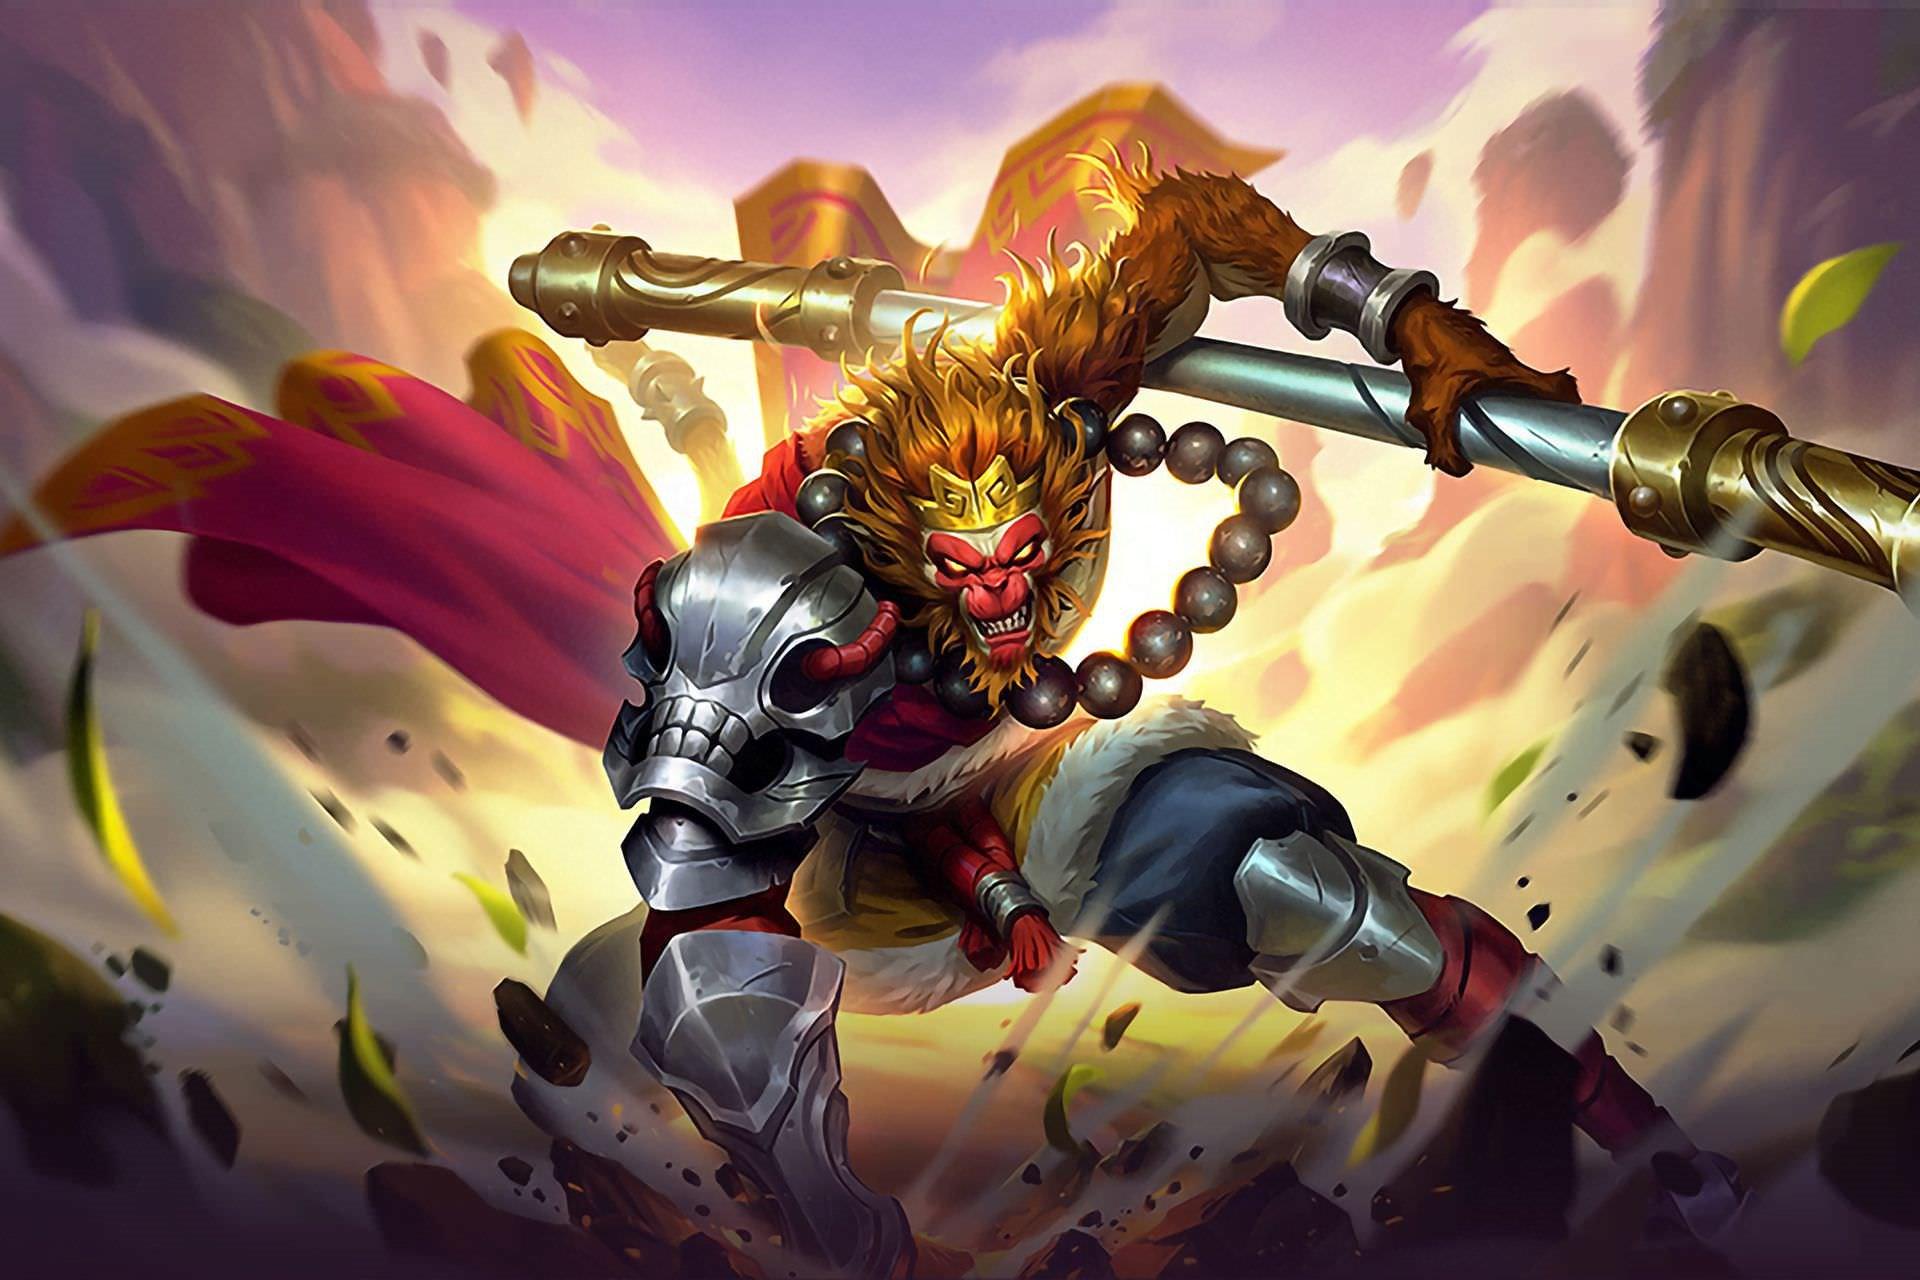 بررسی بازی موبایل Mobile Legends: Bang Bang